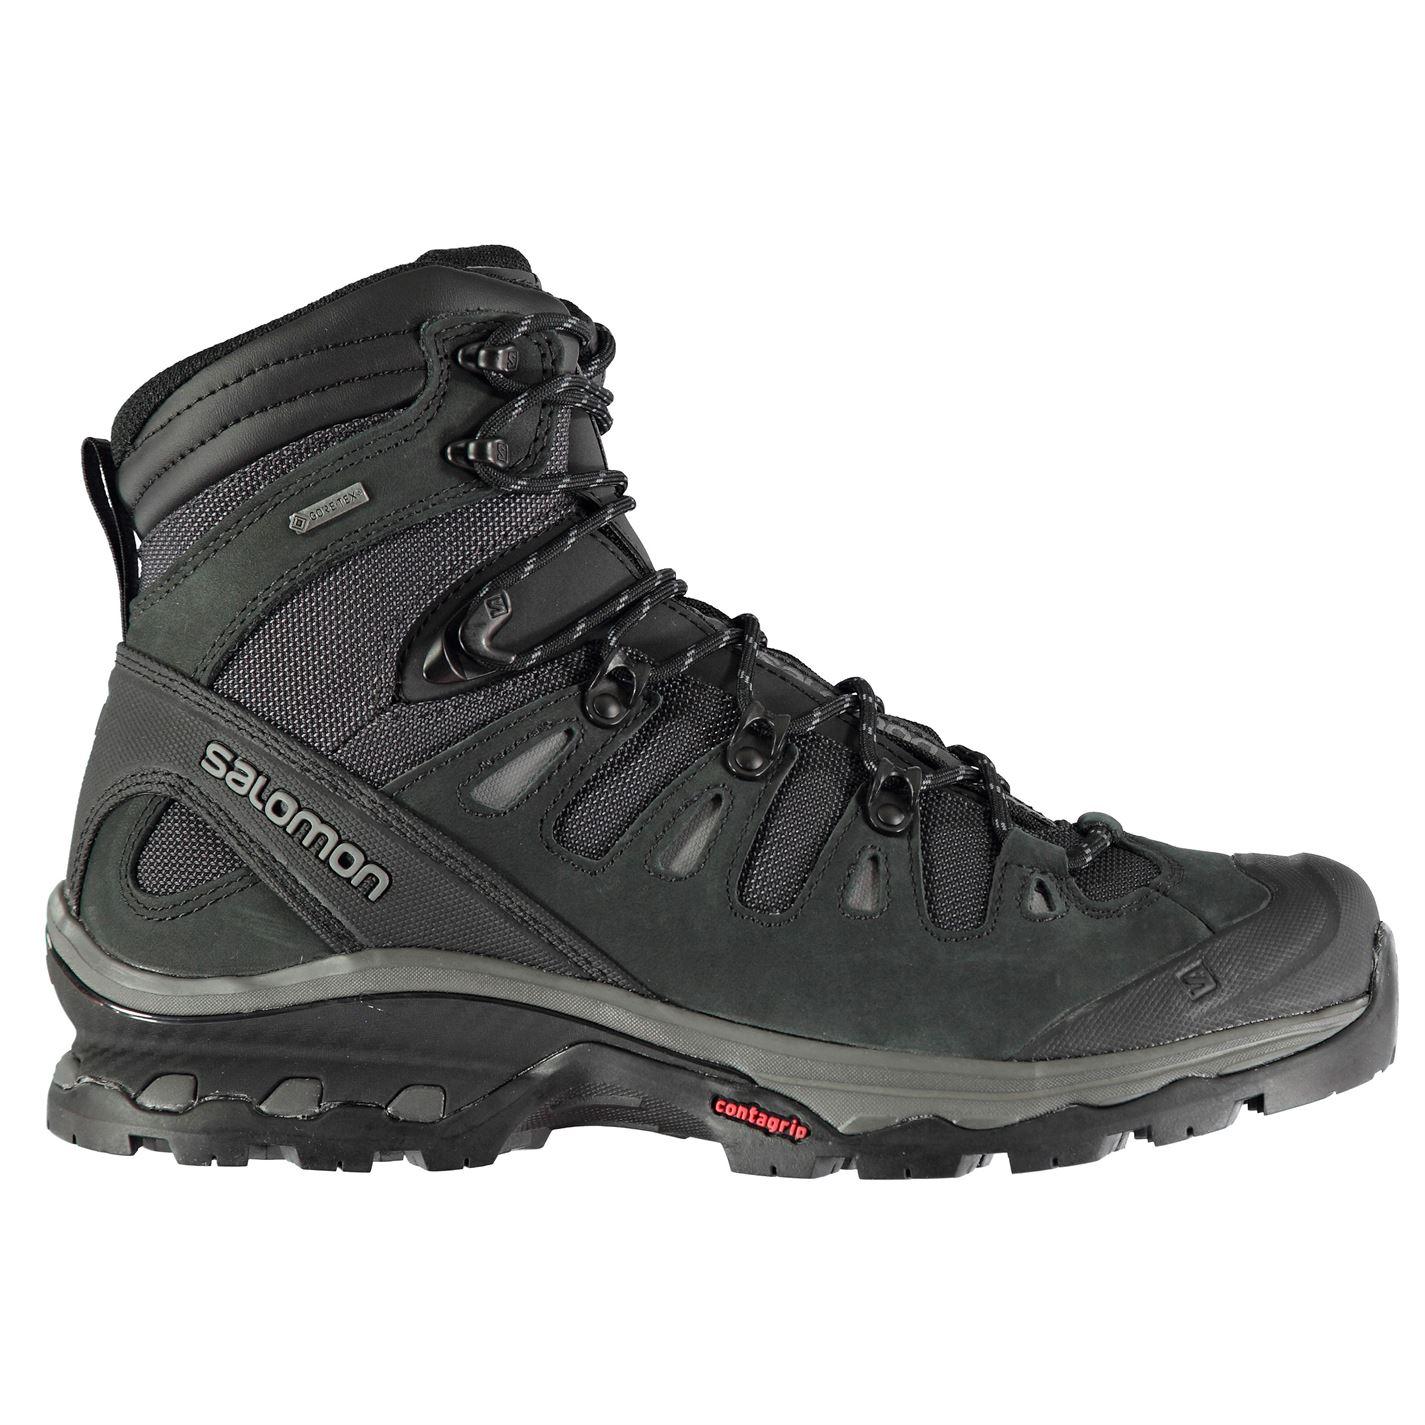 Salomon Quest 4D 3 GTX Mens Walking Boots